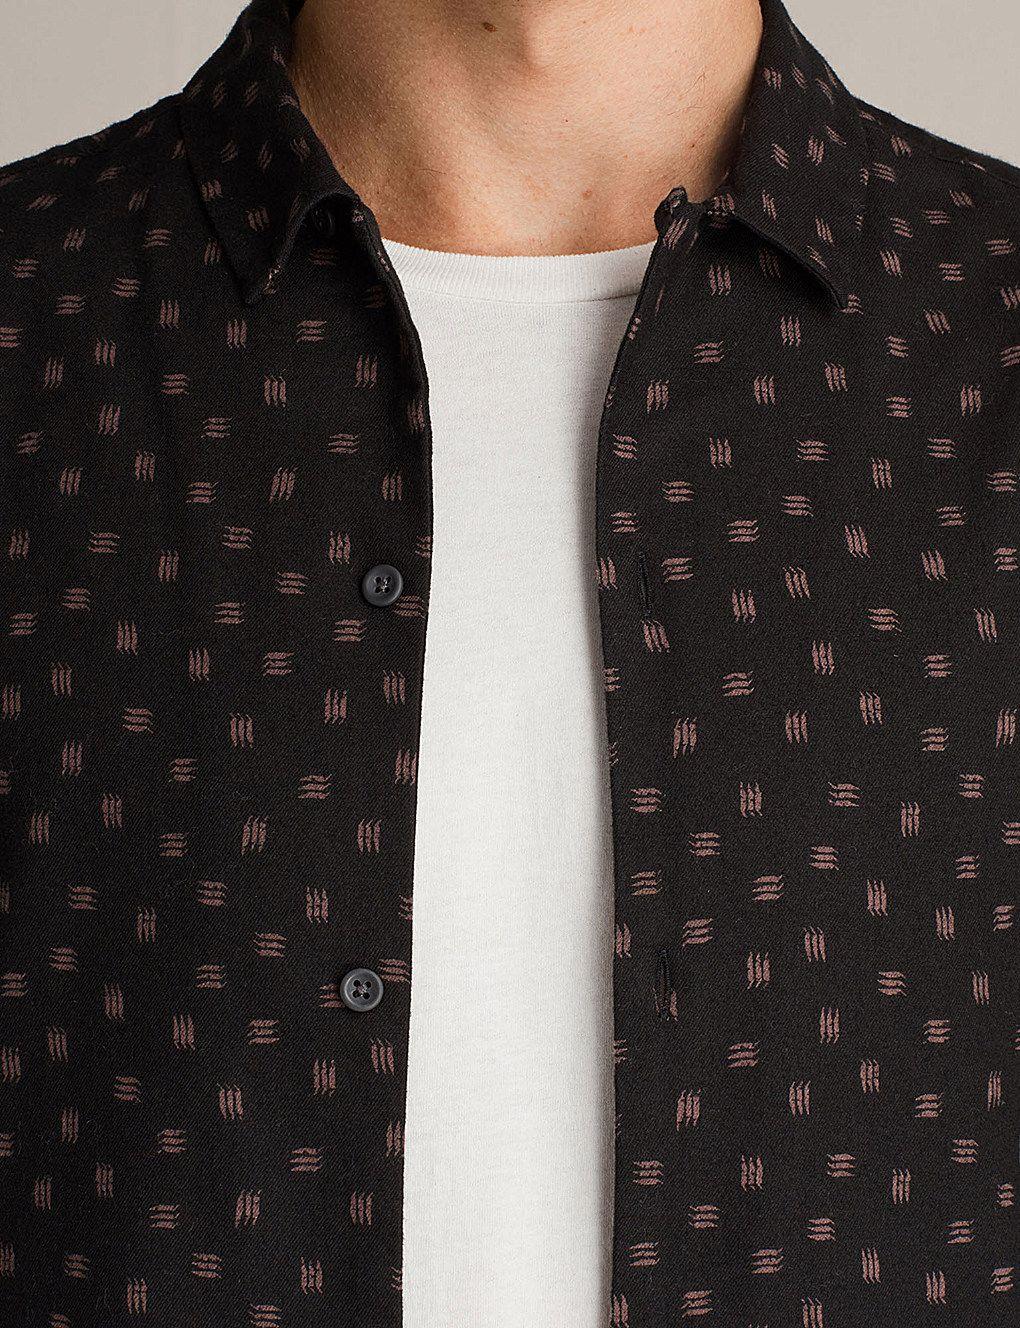 96887668301 Kiefer chilli screen-print brushed flannel shirt   AOP   Shirts ...